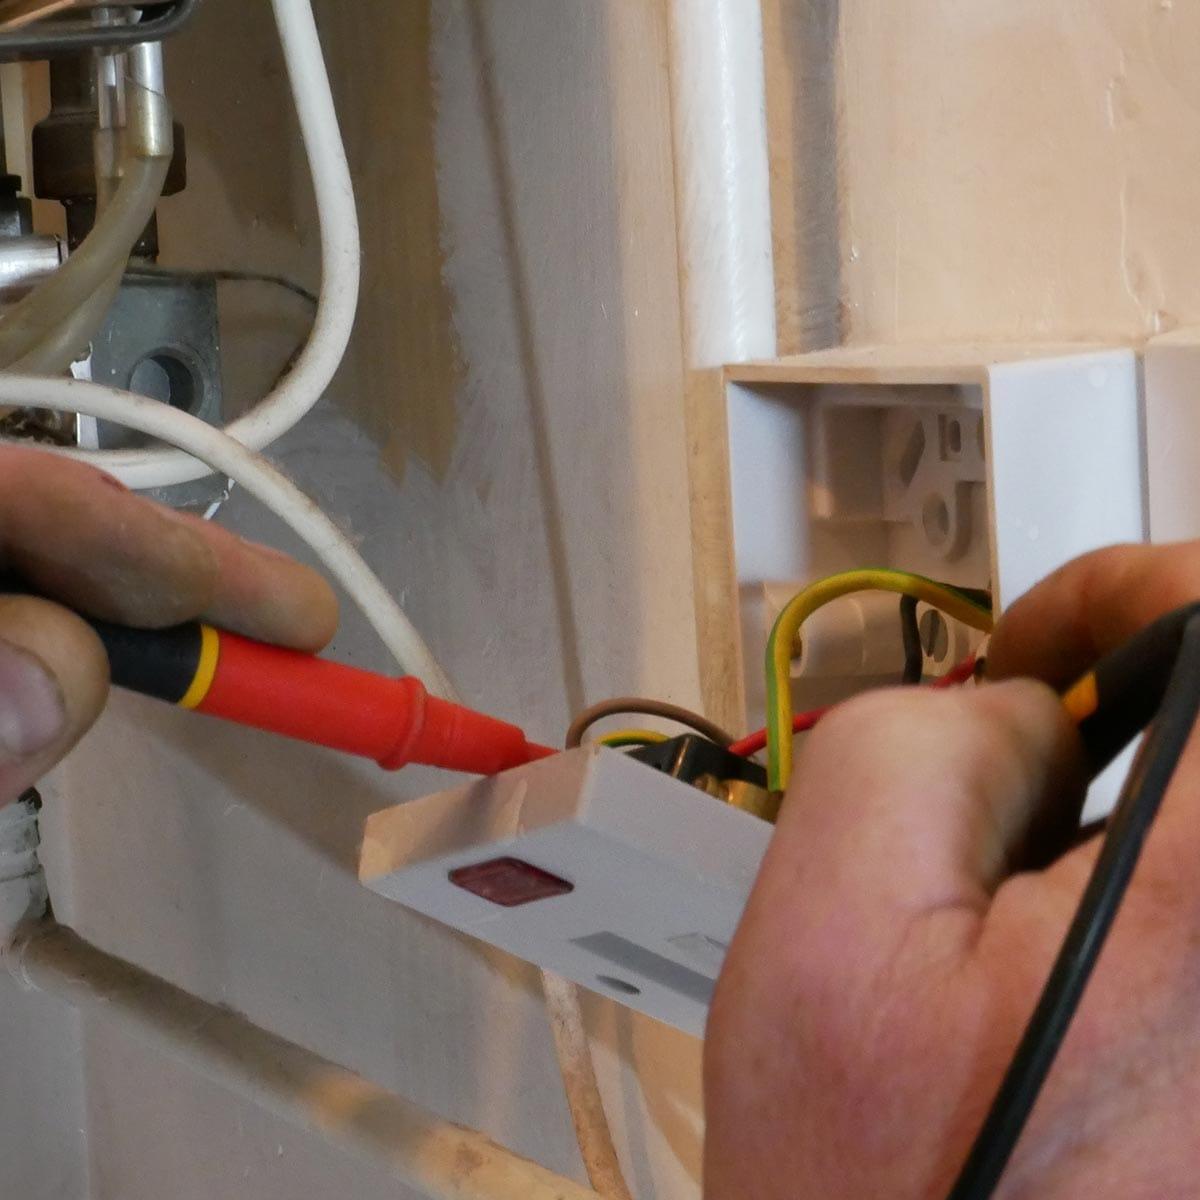 boiler electrical testing